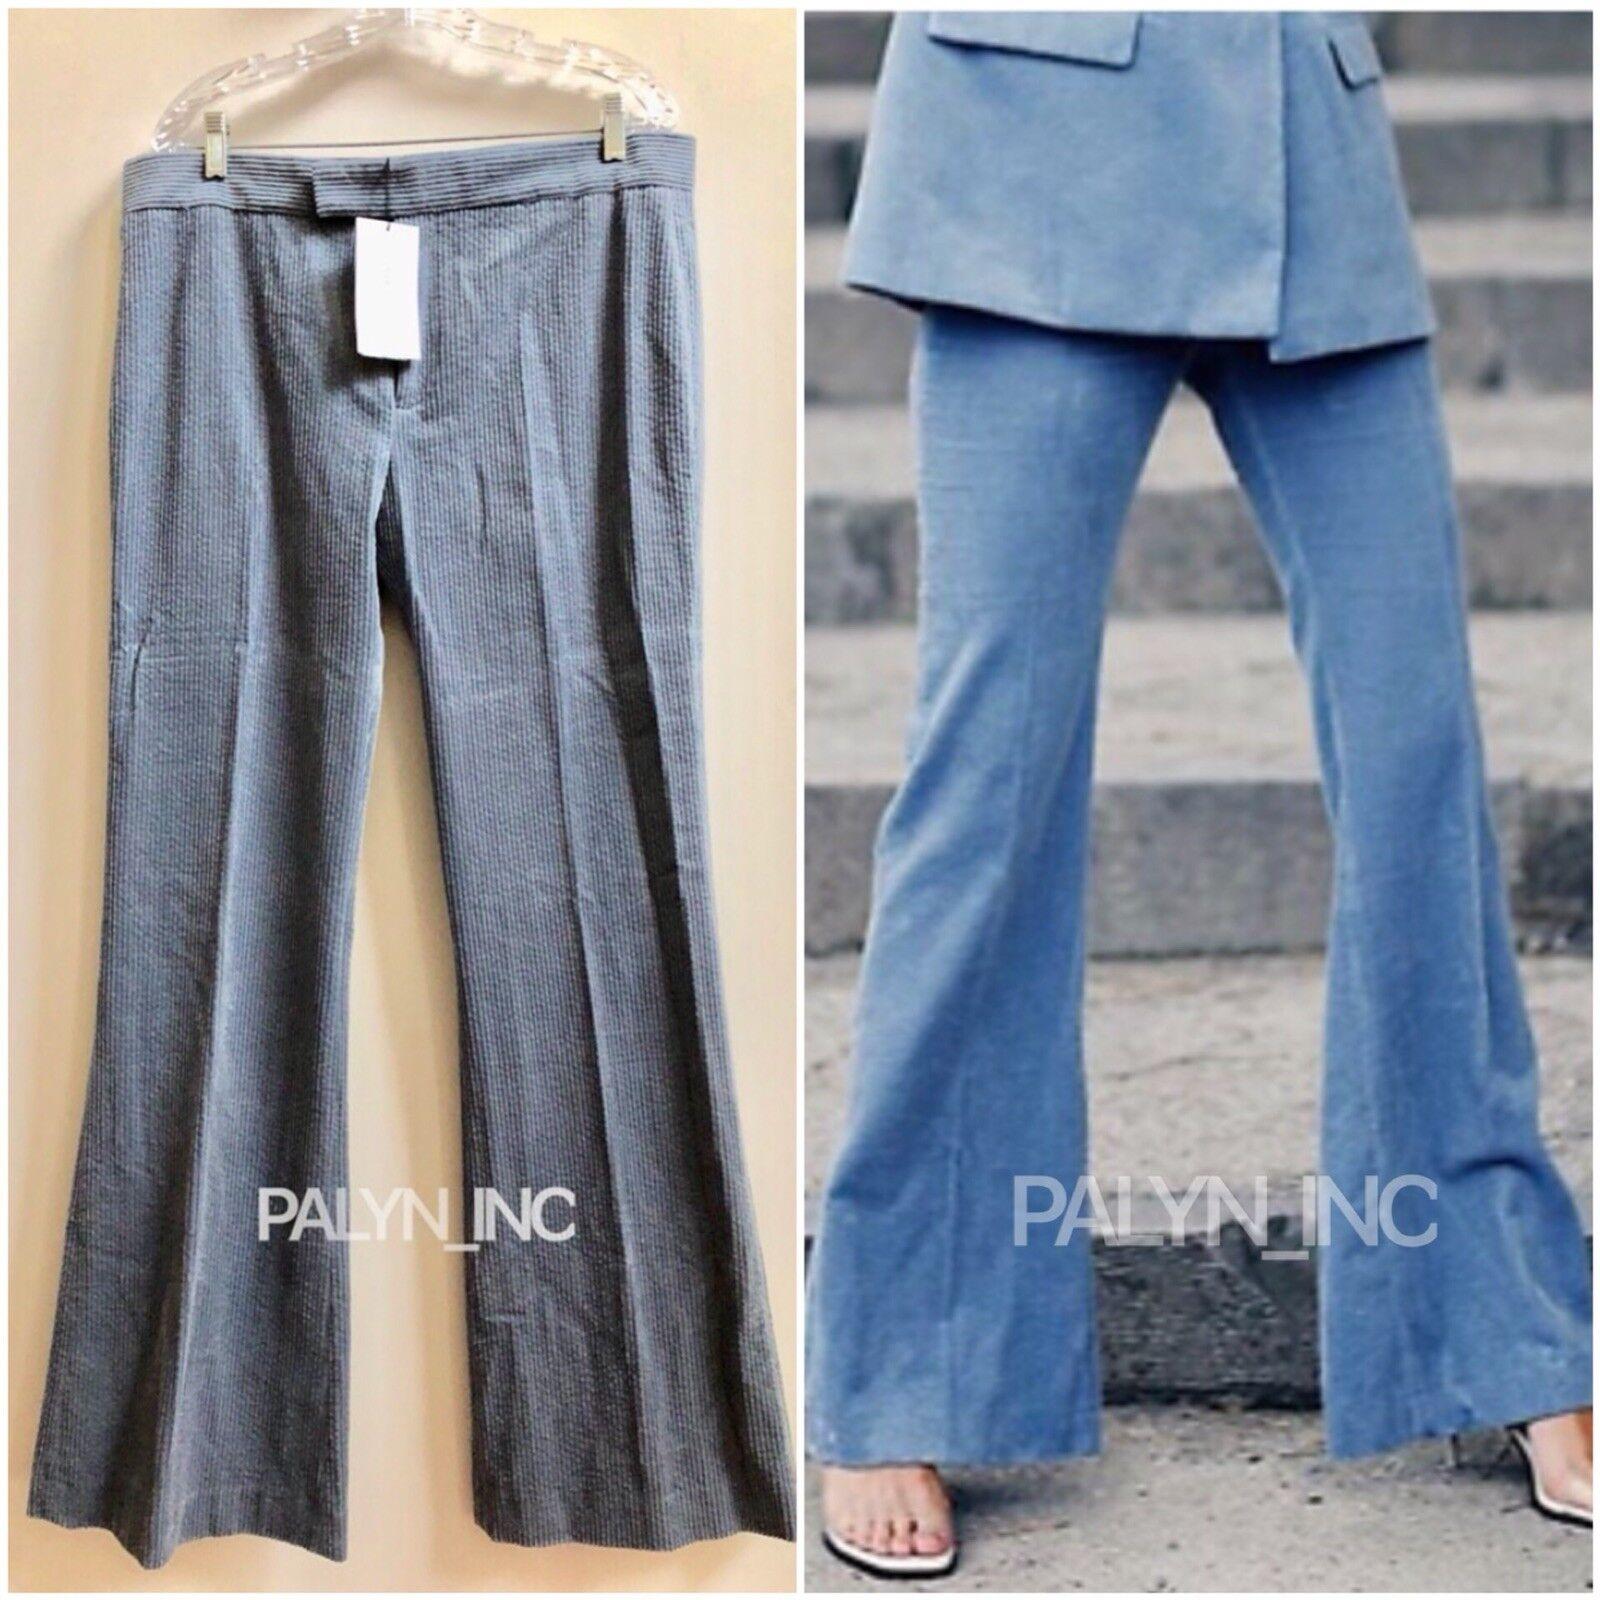 RARE_NWT ZARA AW18 blueE GREY FLARED CORDUROY PANTS 8048 619_XS S M L XL